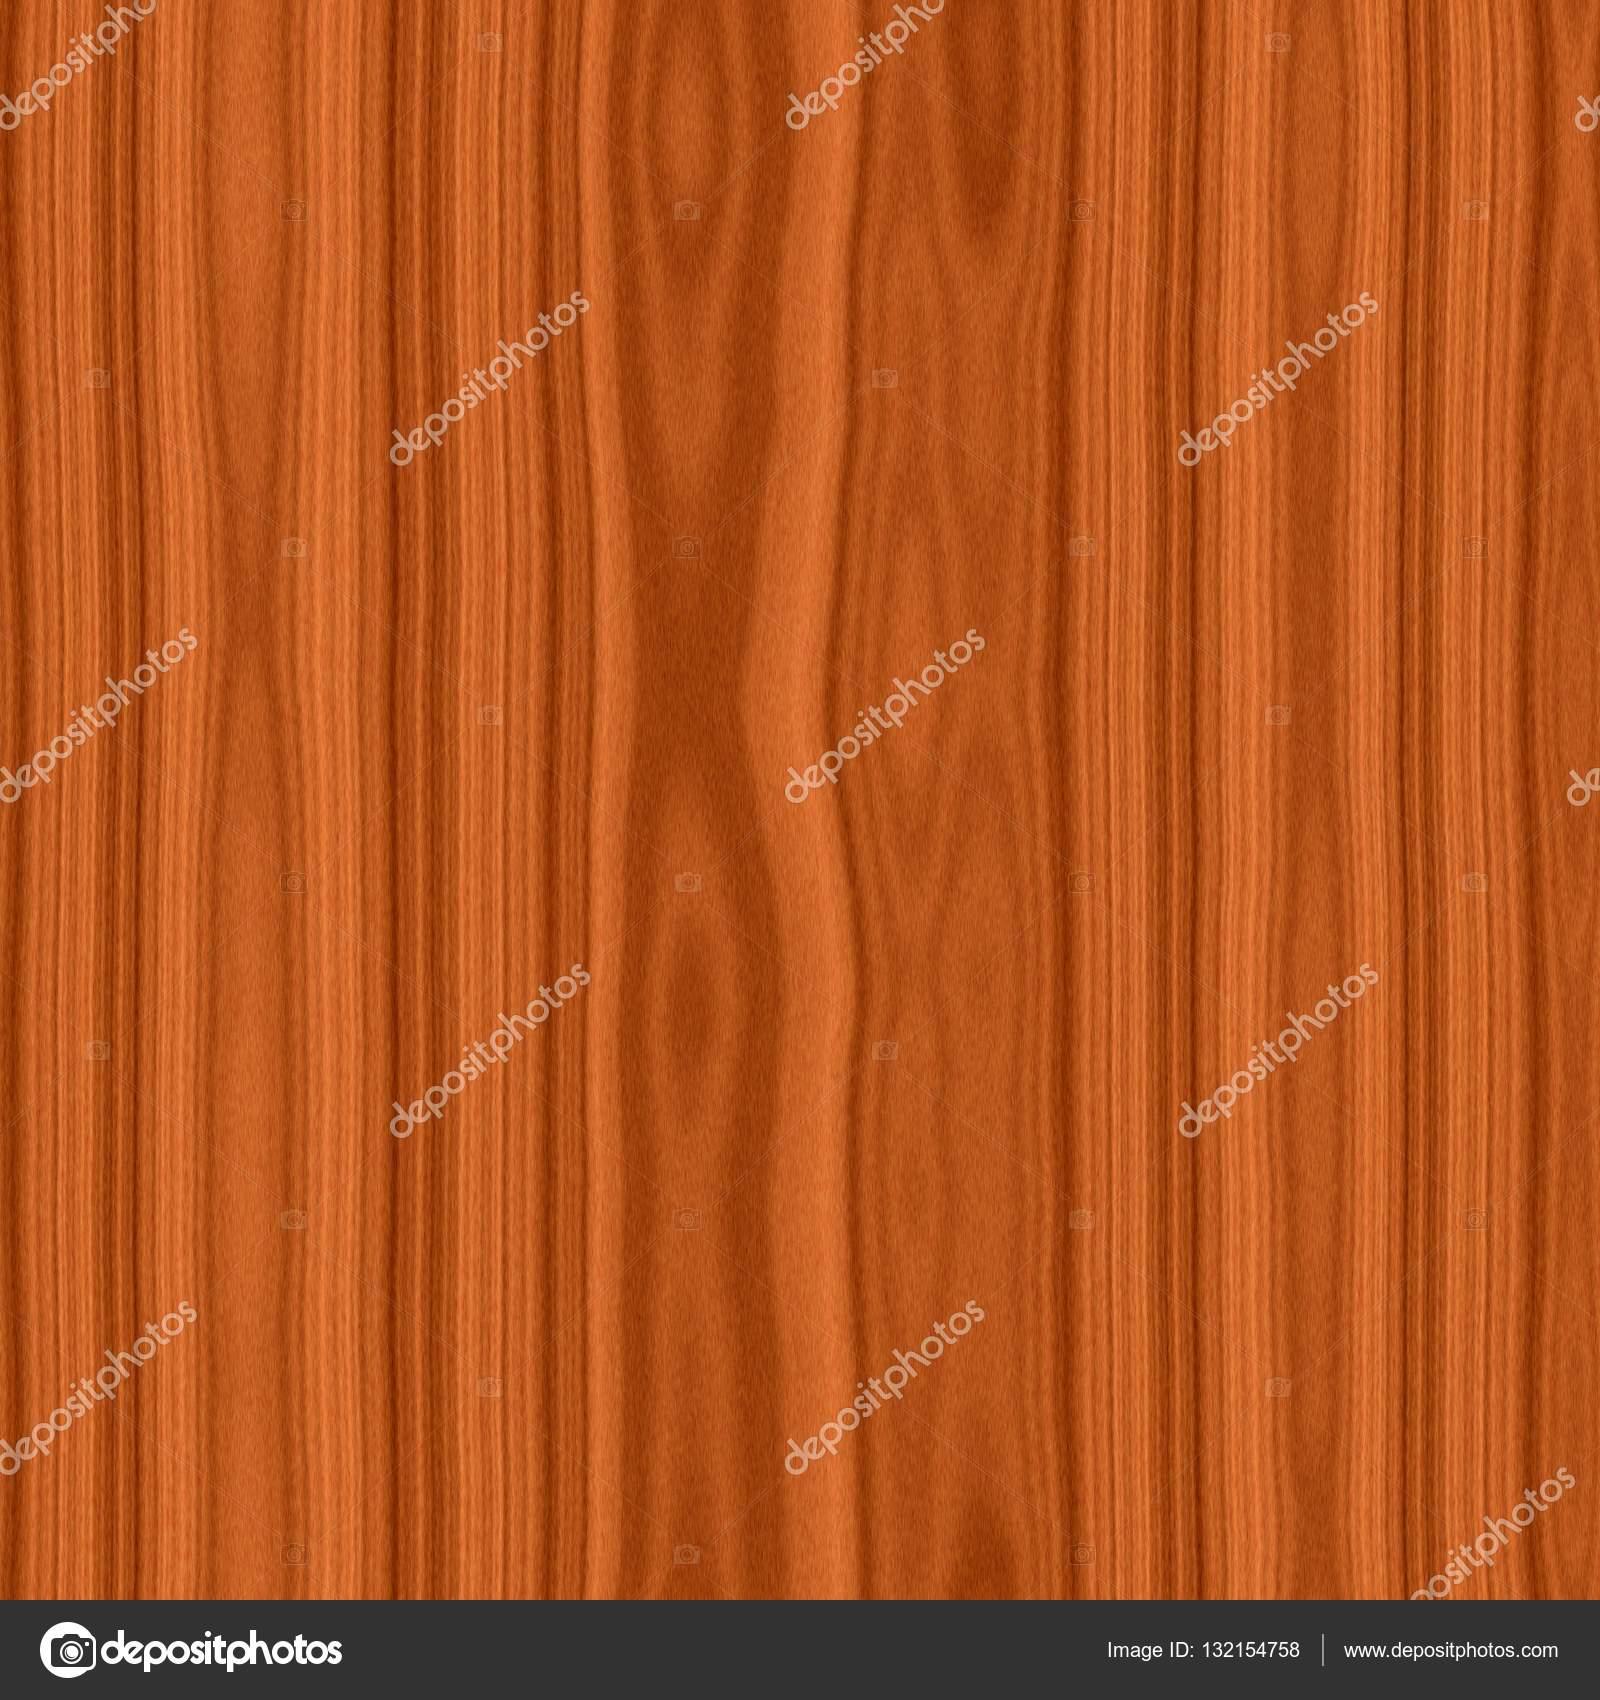 Farbe Apricot Orange Grafische Oberflache Holzbrett Stockfoto